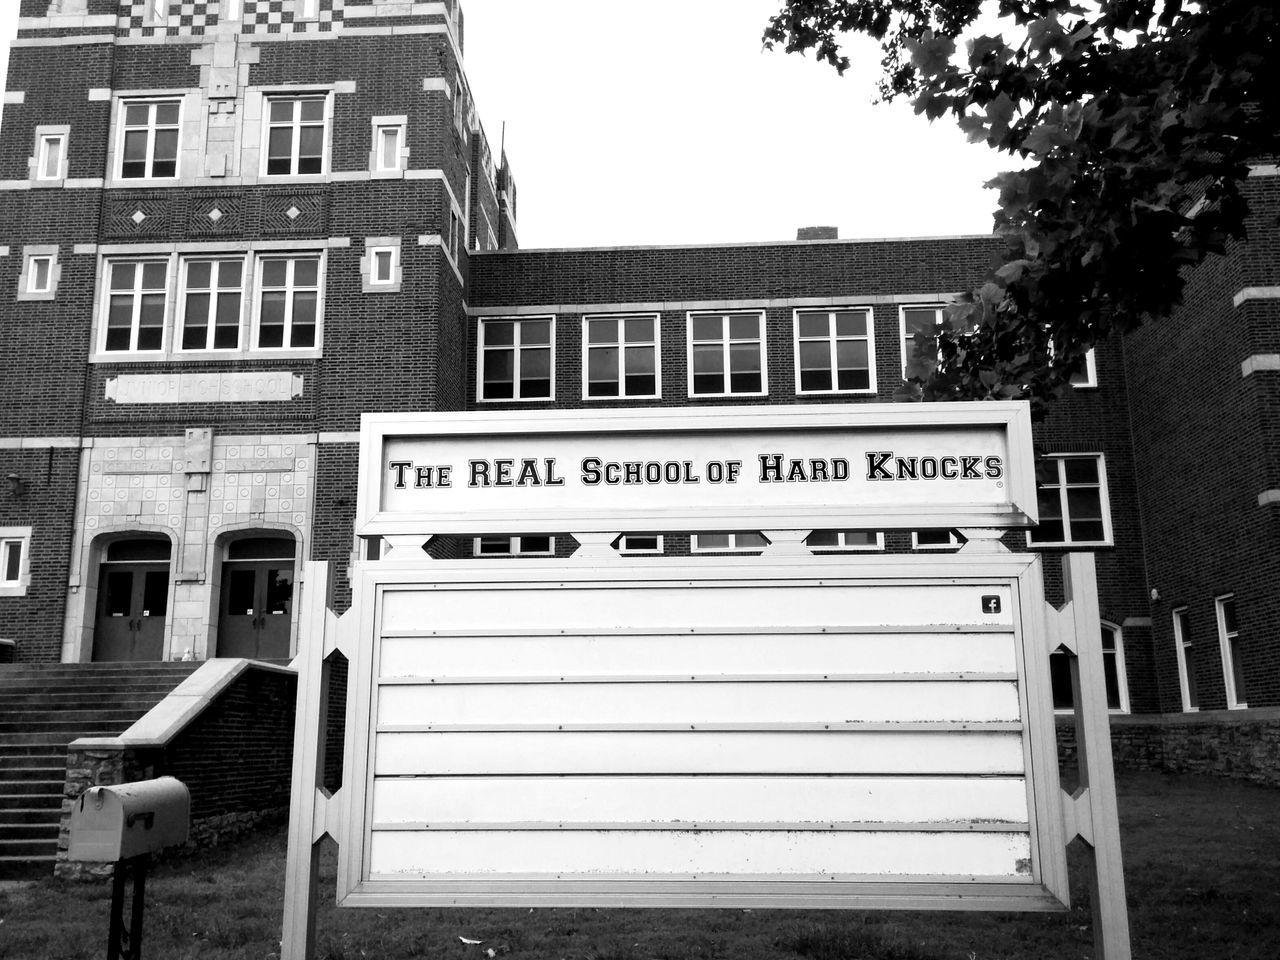 School Of Hard Knocks Urbex Urbex Photographie Urbexphotography Urbexexplorer Abandoned School Kansas Fort Scott Exploring New Ground Travel Photography Black And White Photography Sign